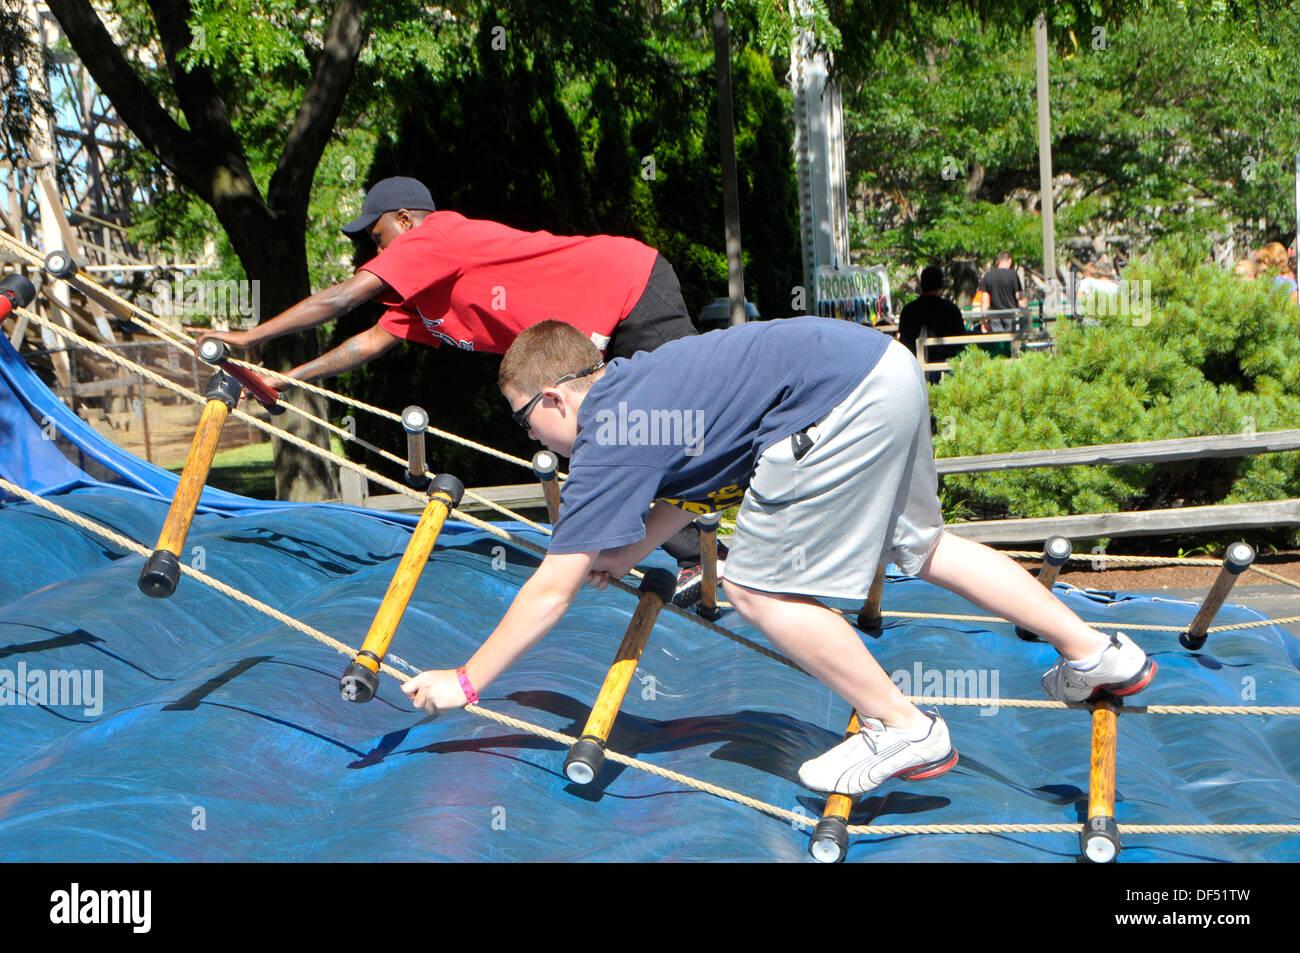 Stage d'escalade d'obstacles Cedar Point Amusement Park Sandusky Ohio Photo Stock